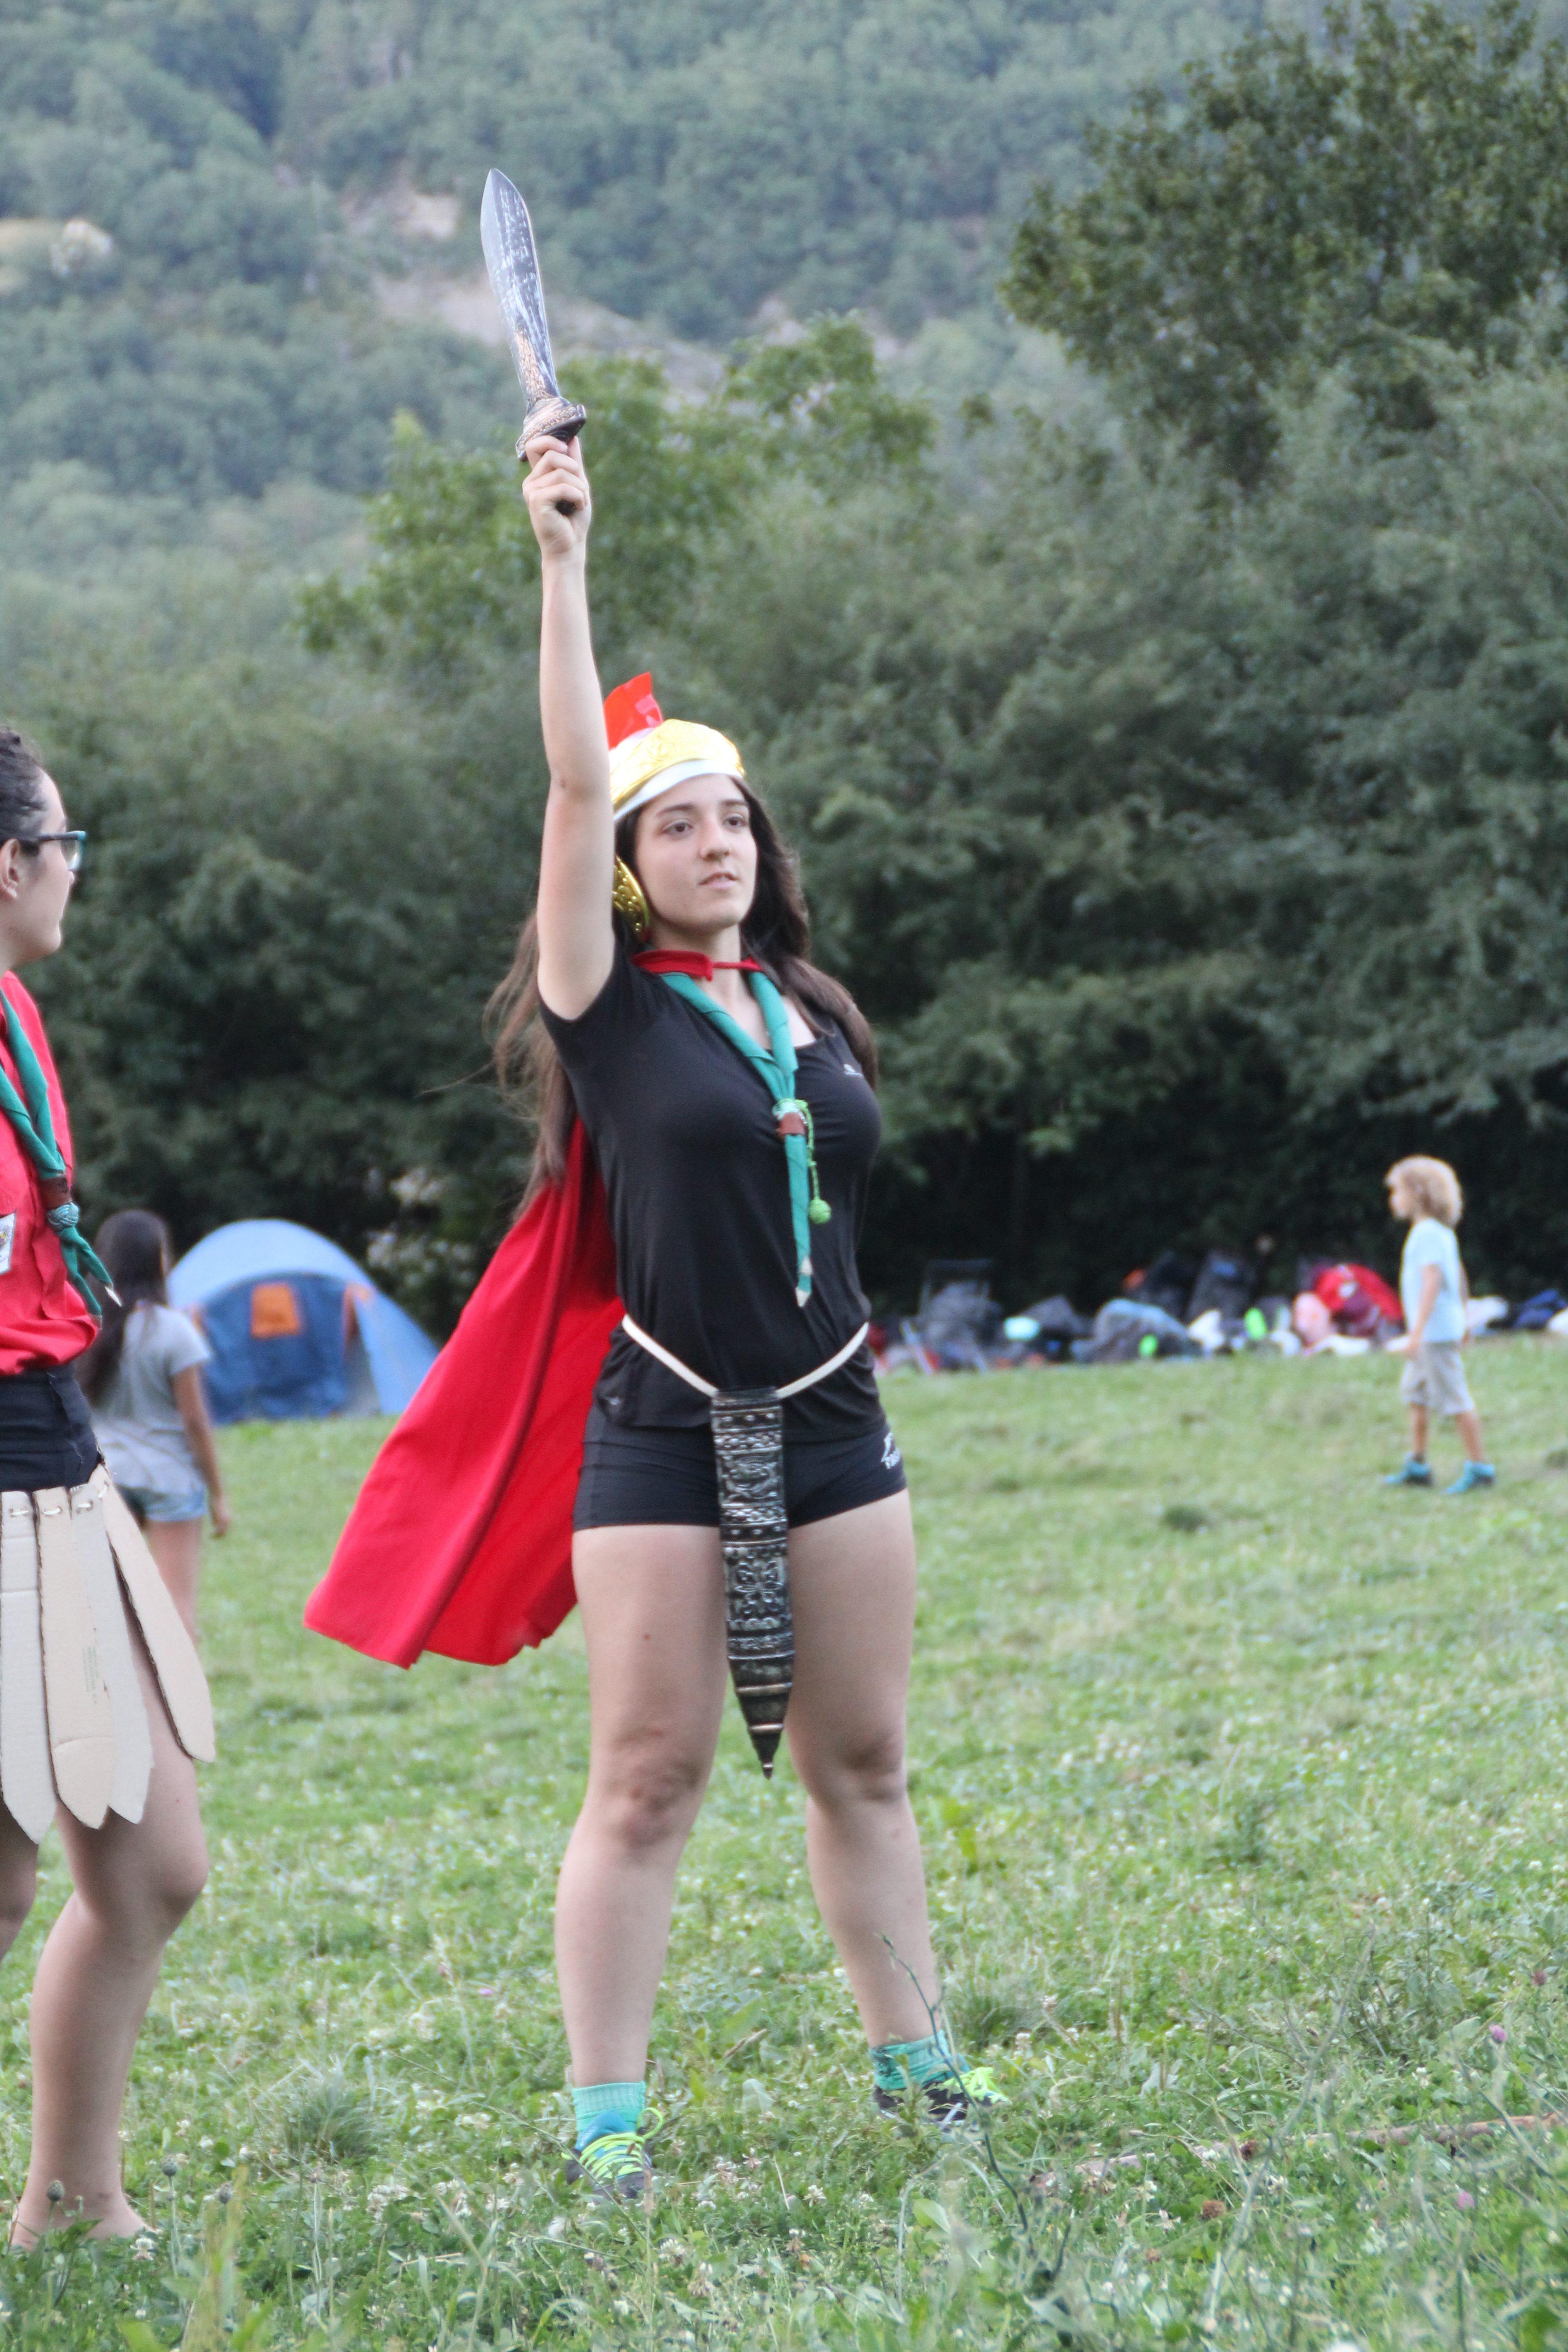 15-16 - Grupo - Campamento de verano - P276